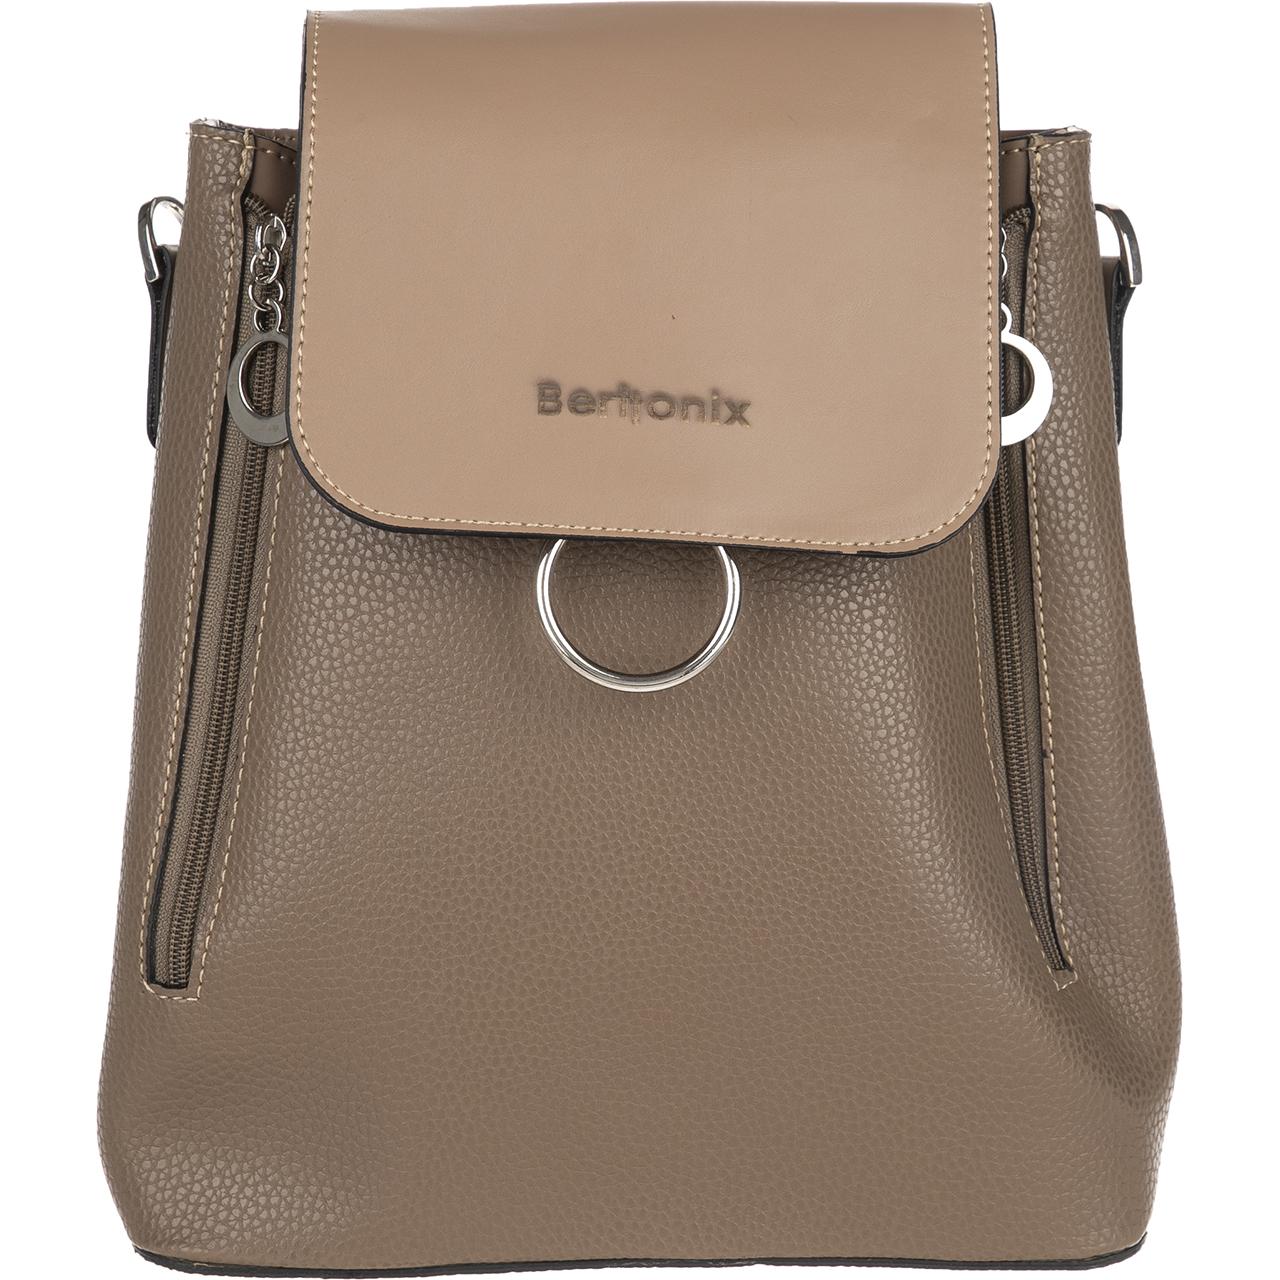 کوله پشتی زنانه برتونیکس مدل B101-30 -  - 2